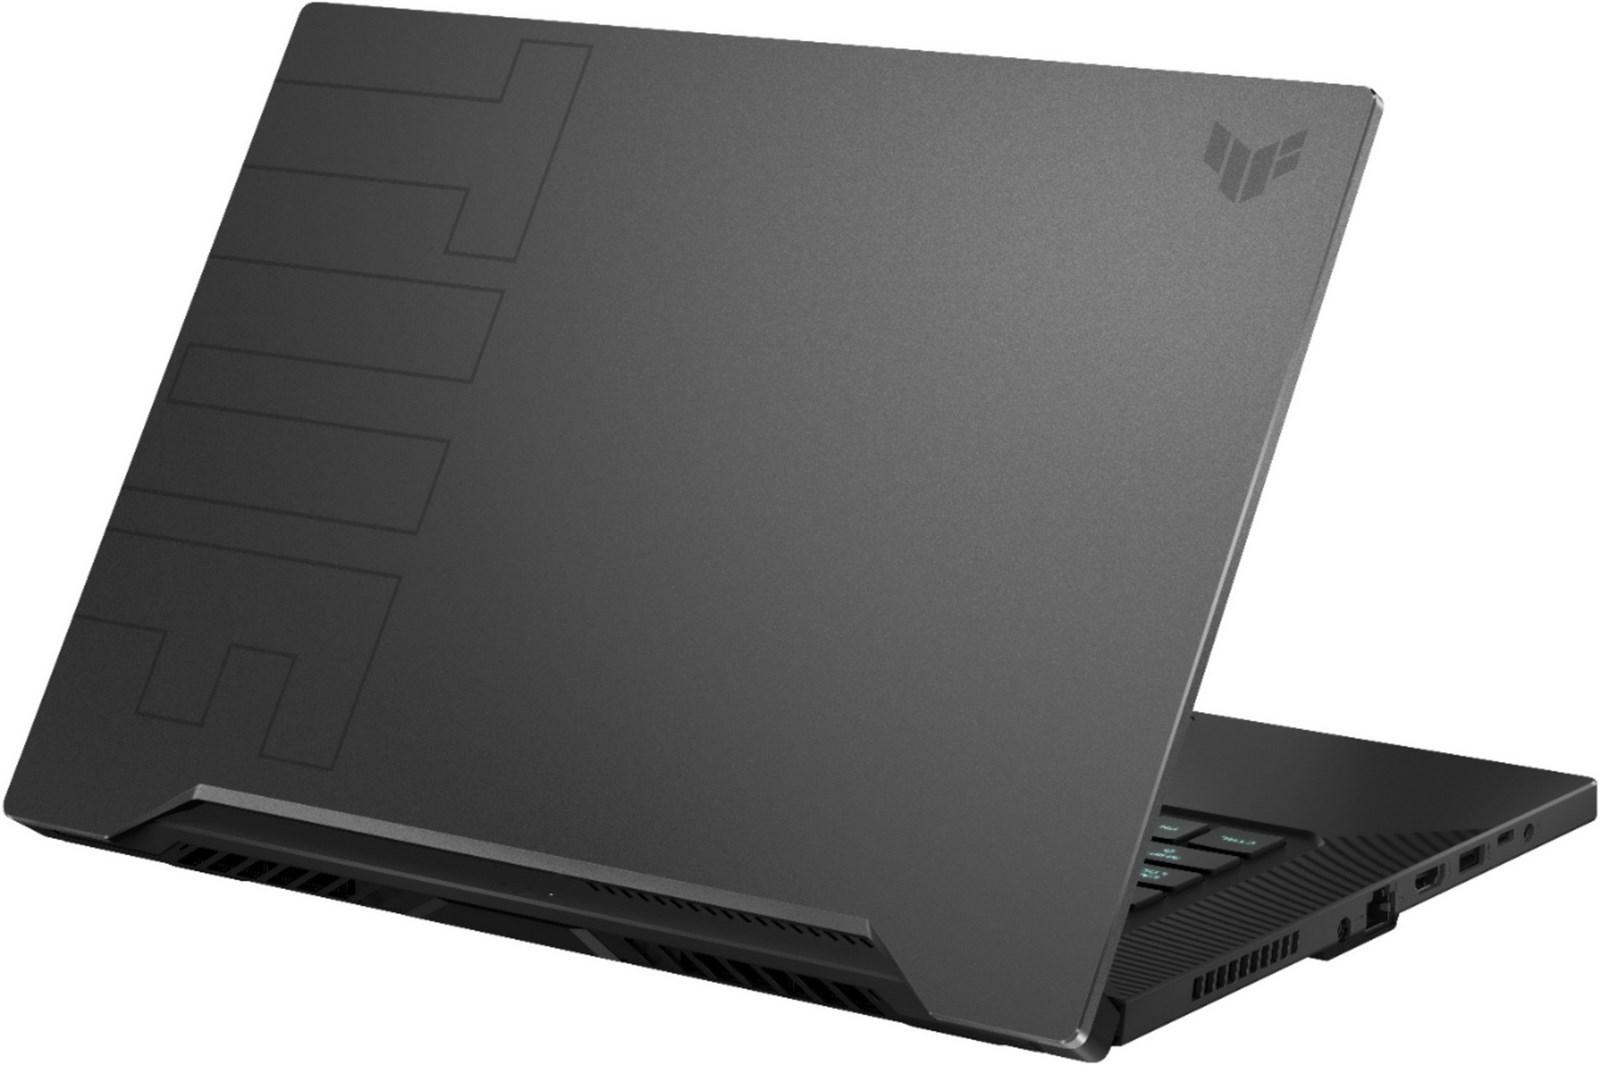 Ноутбук Asus Tuf Dash FX516PM-211.TF15 (90NR05X1-M03100)  - 3